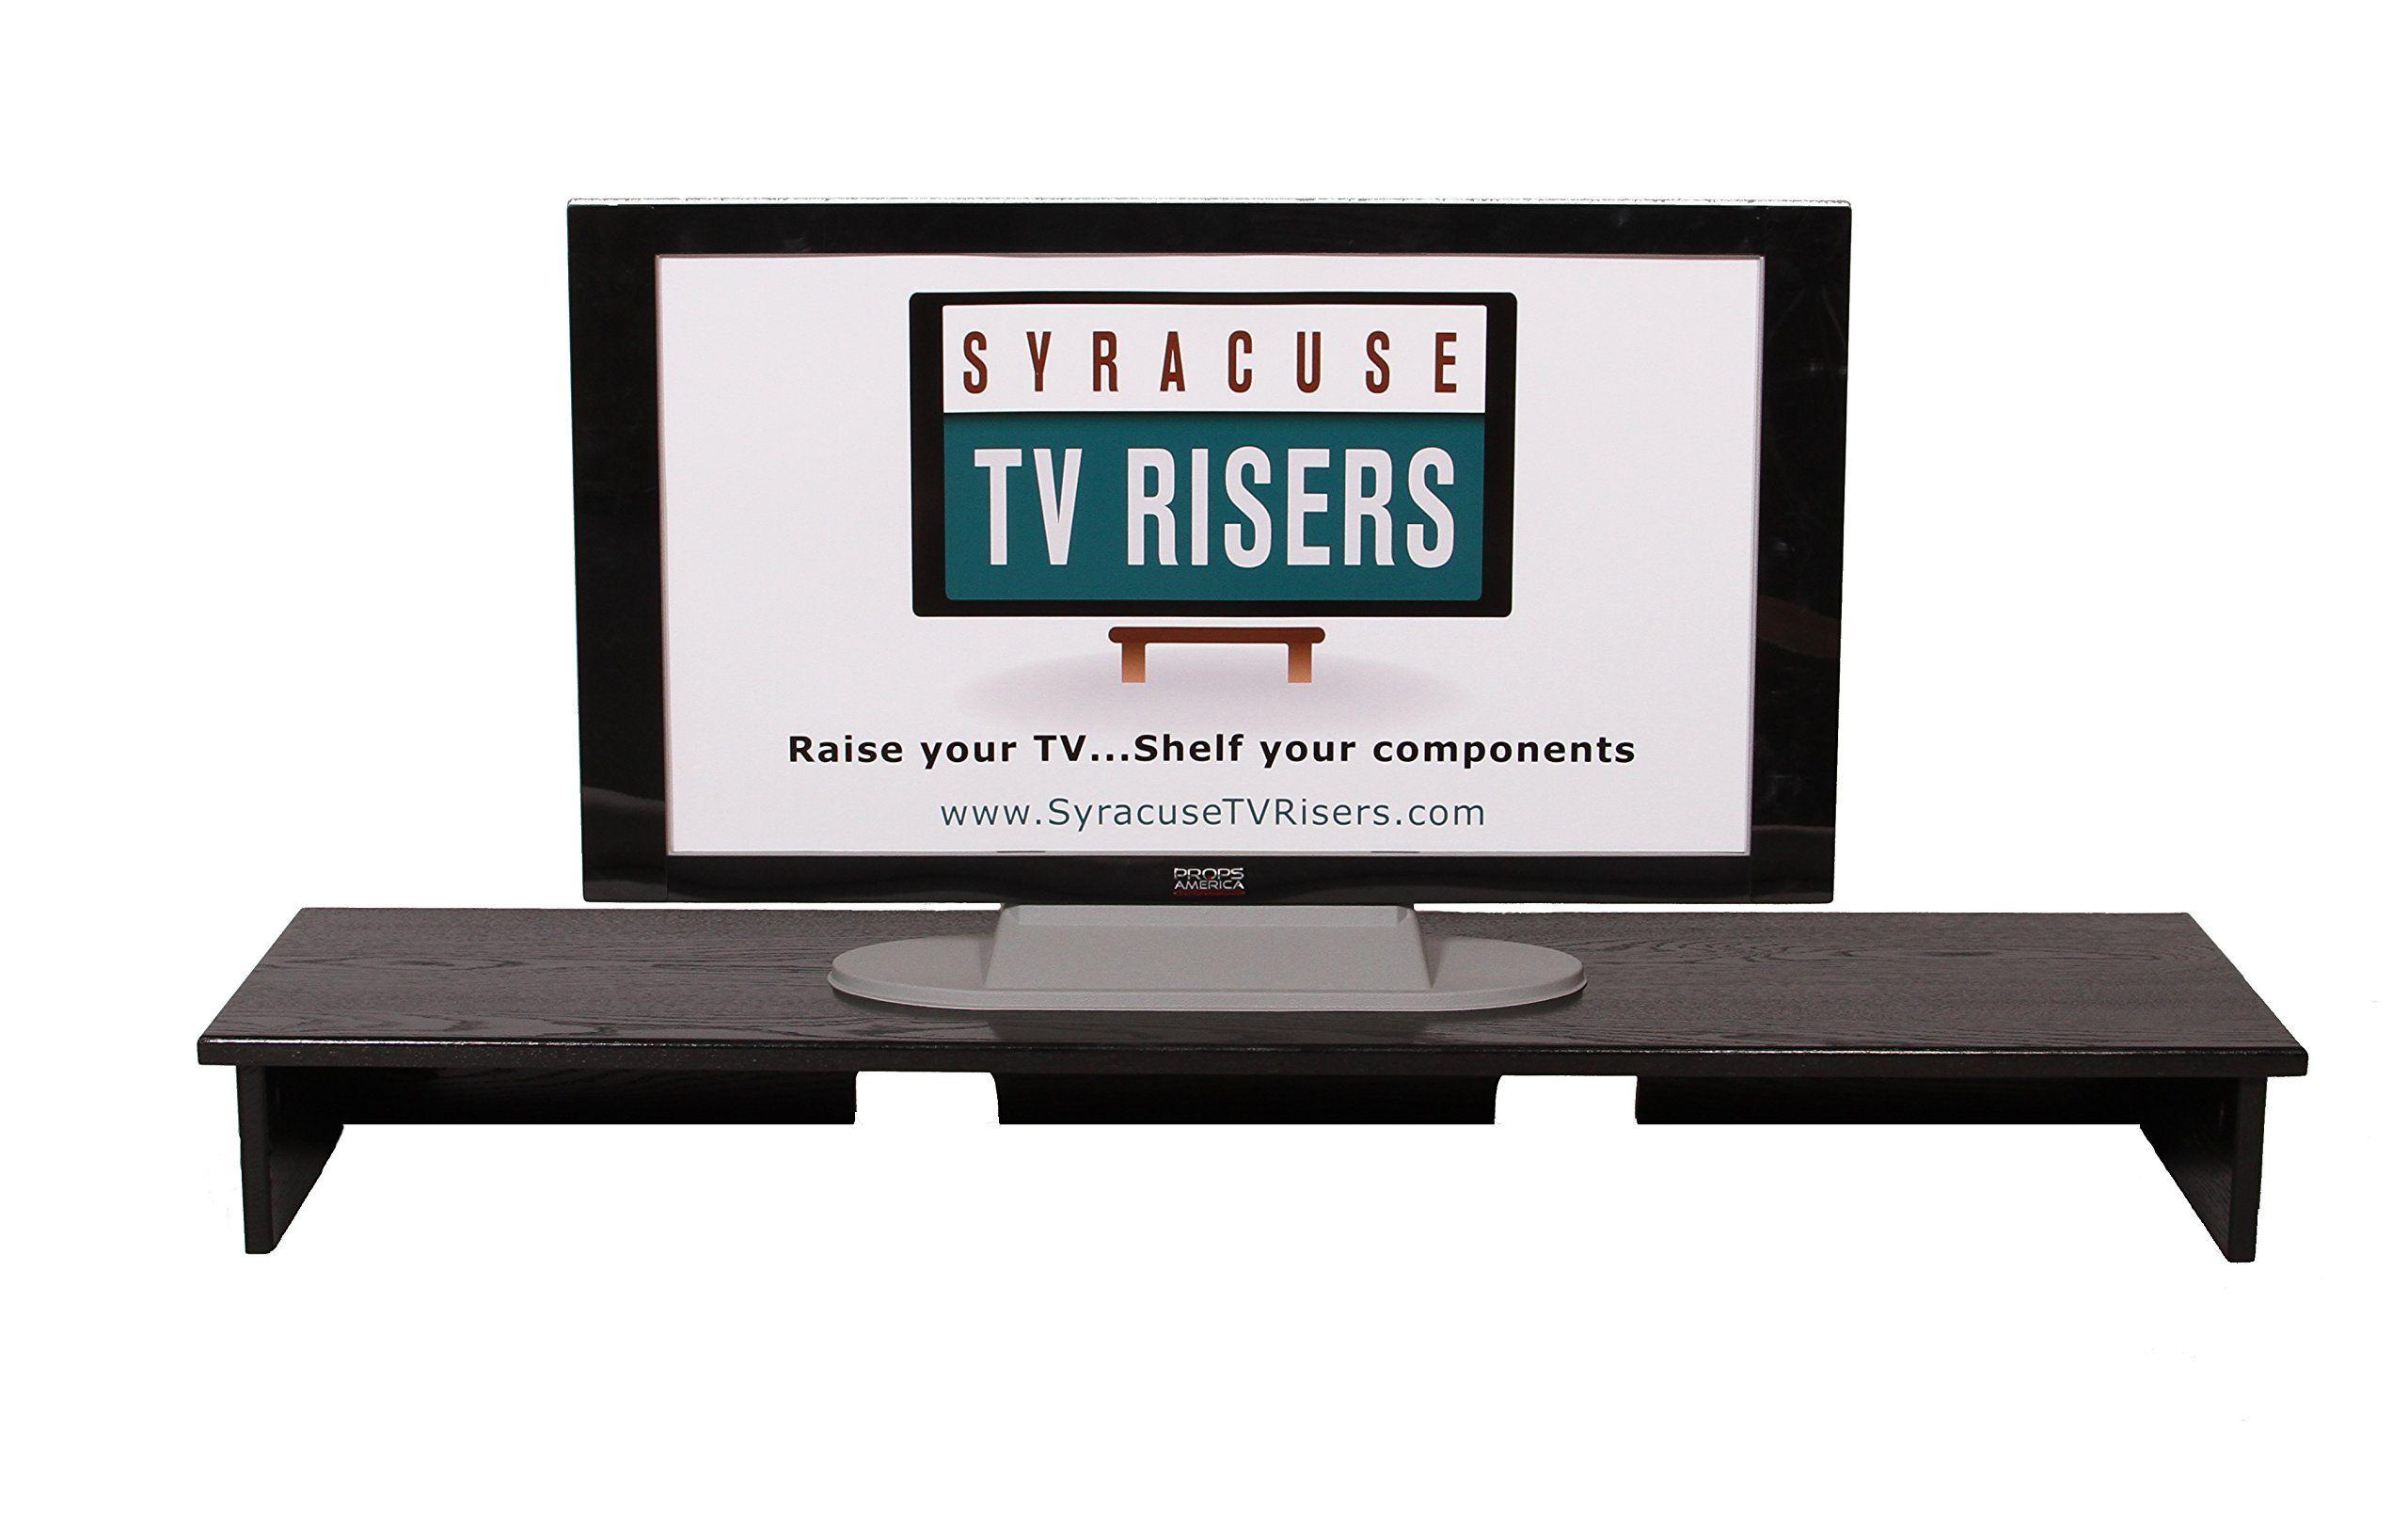 Black X Large Smooth Top Sound Bar Tv Riser 53x13x6 Outside